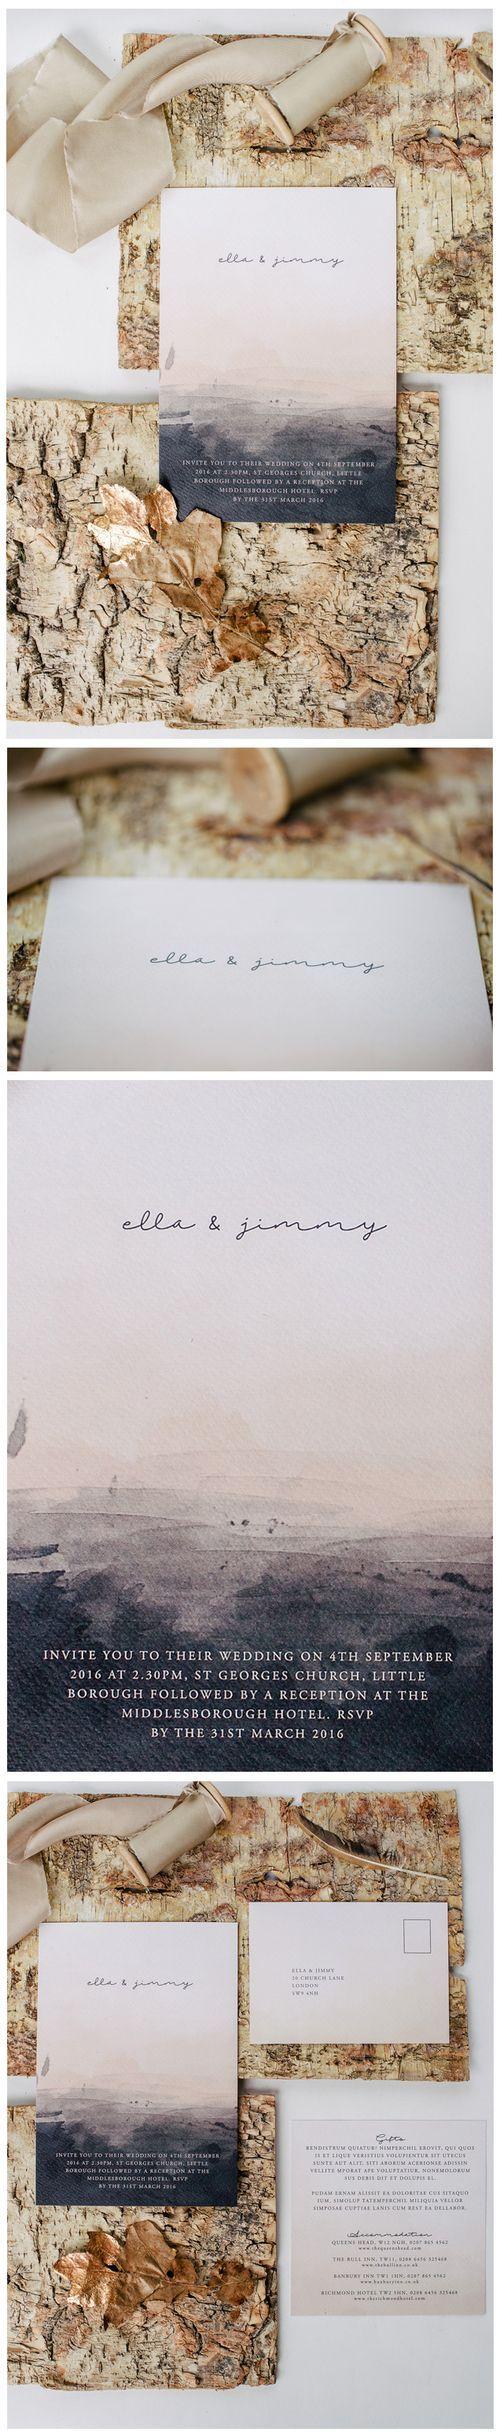 sample invitation letter to attend an event%0A Dusty Desire wedding invitation by Lilac u    White  Boho wedding invites   Bohemian weddings  Modern invitation